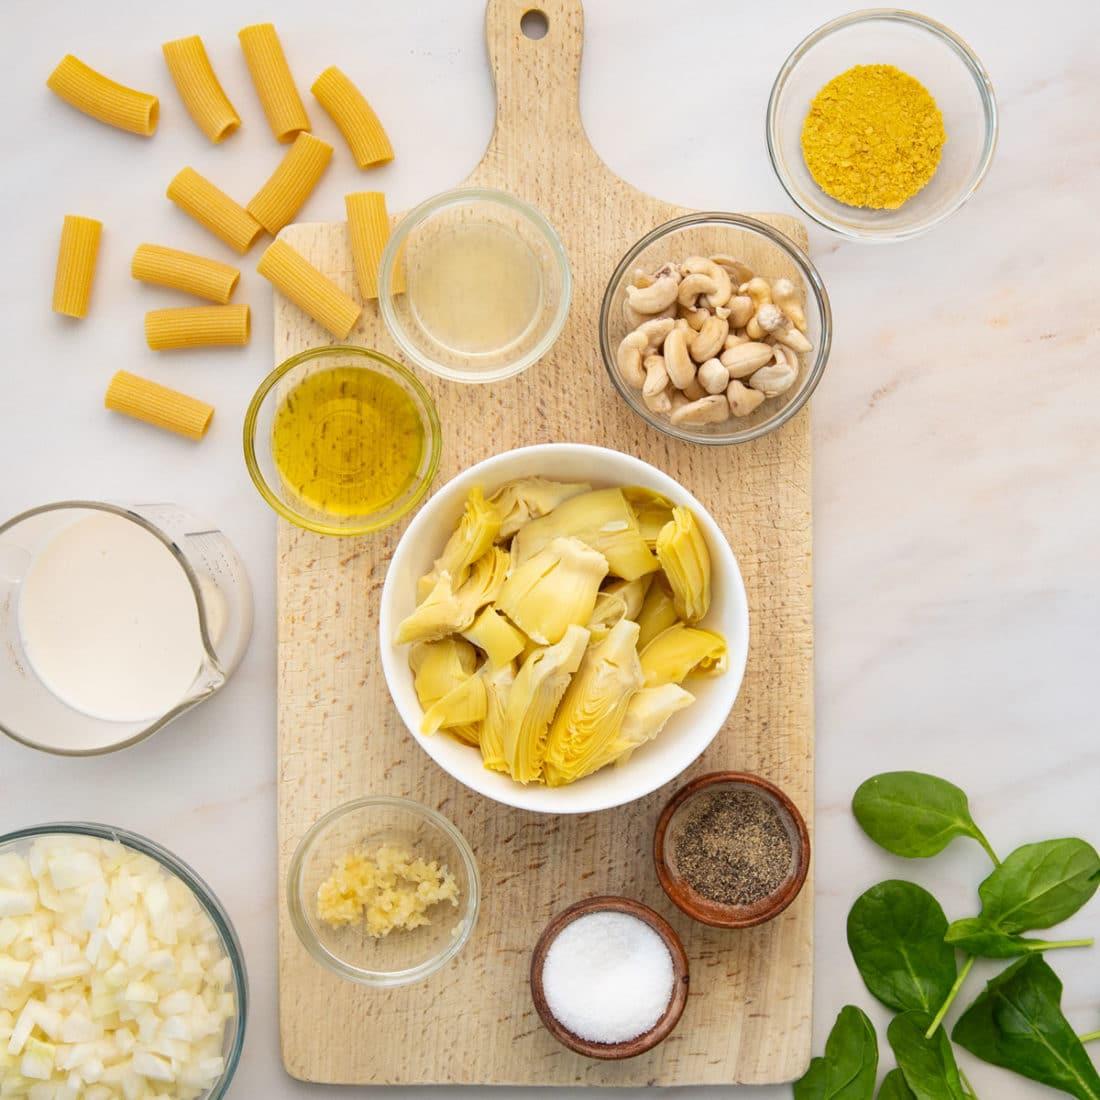 artichoke, cashews, nutritional yeast, almond milk, noodles, butter, spices